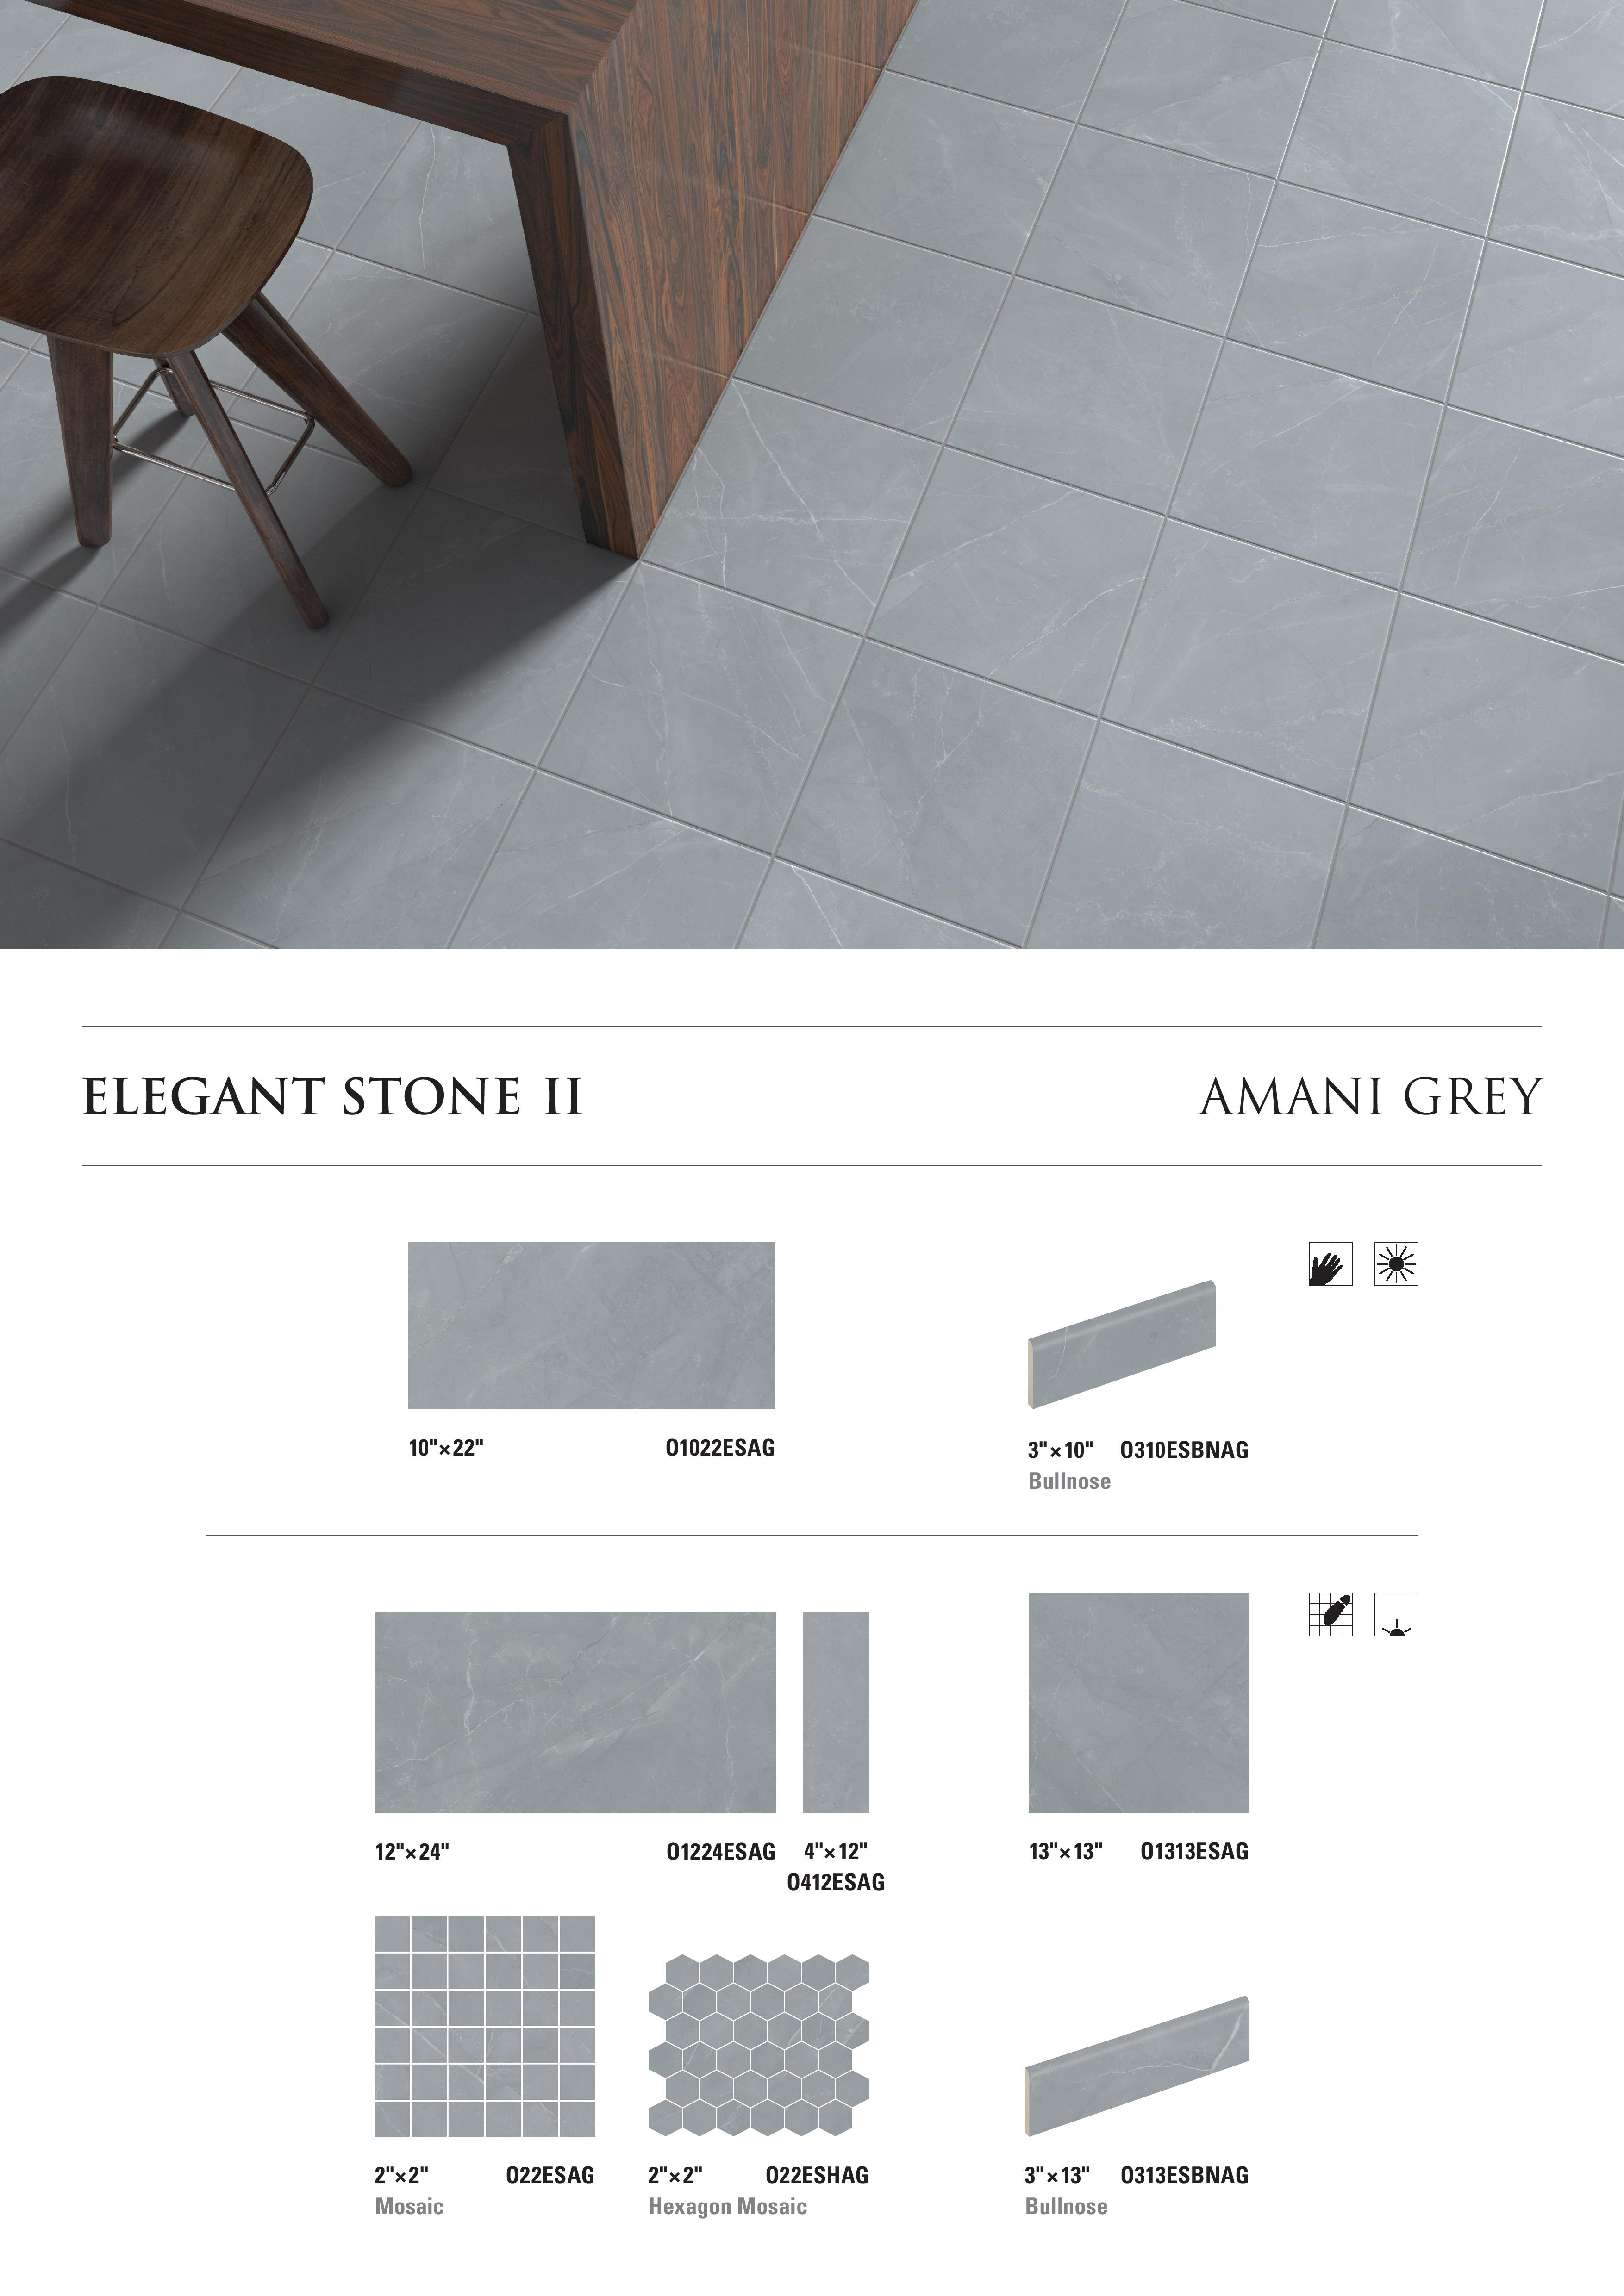 Elegant Stone II Amani Grey by Opulenza at belktile.com